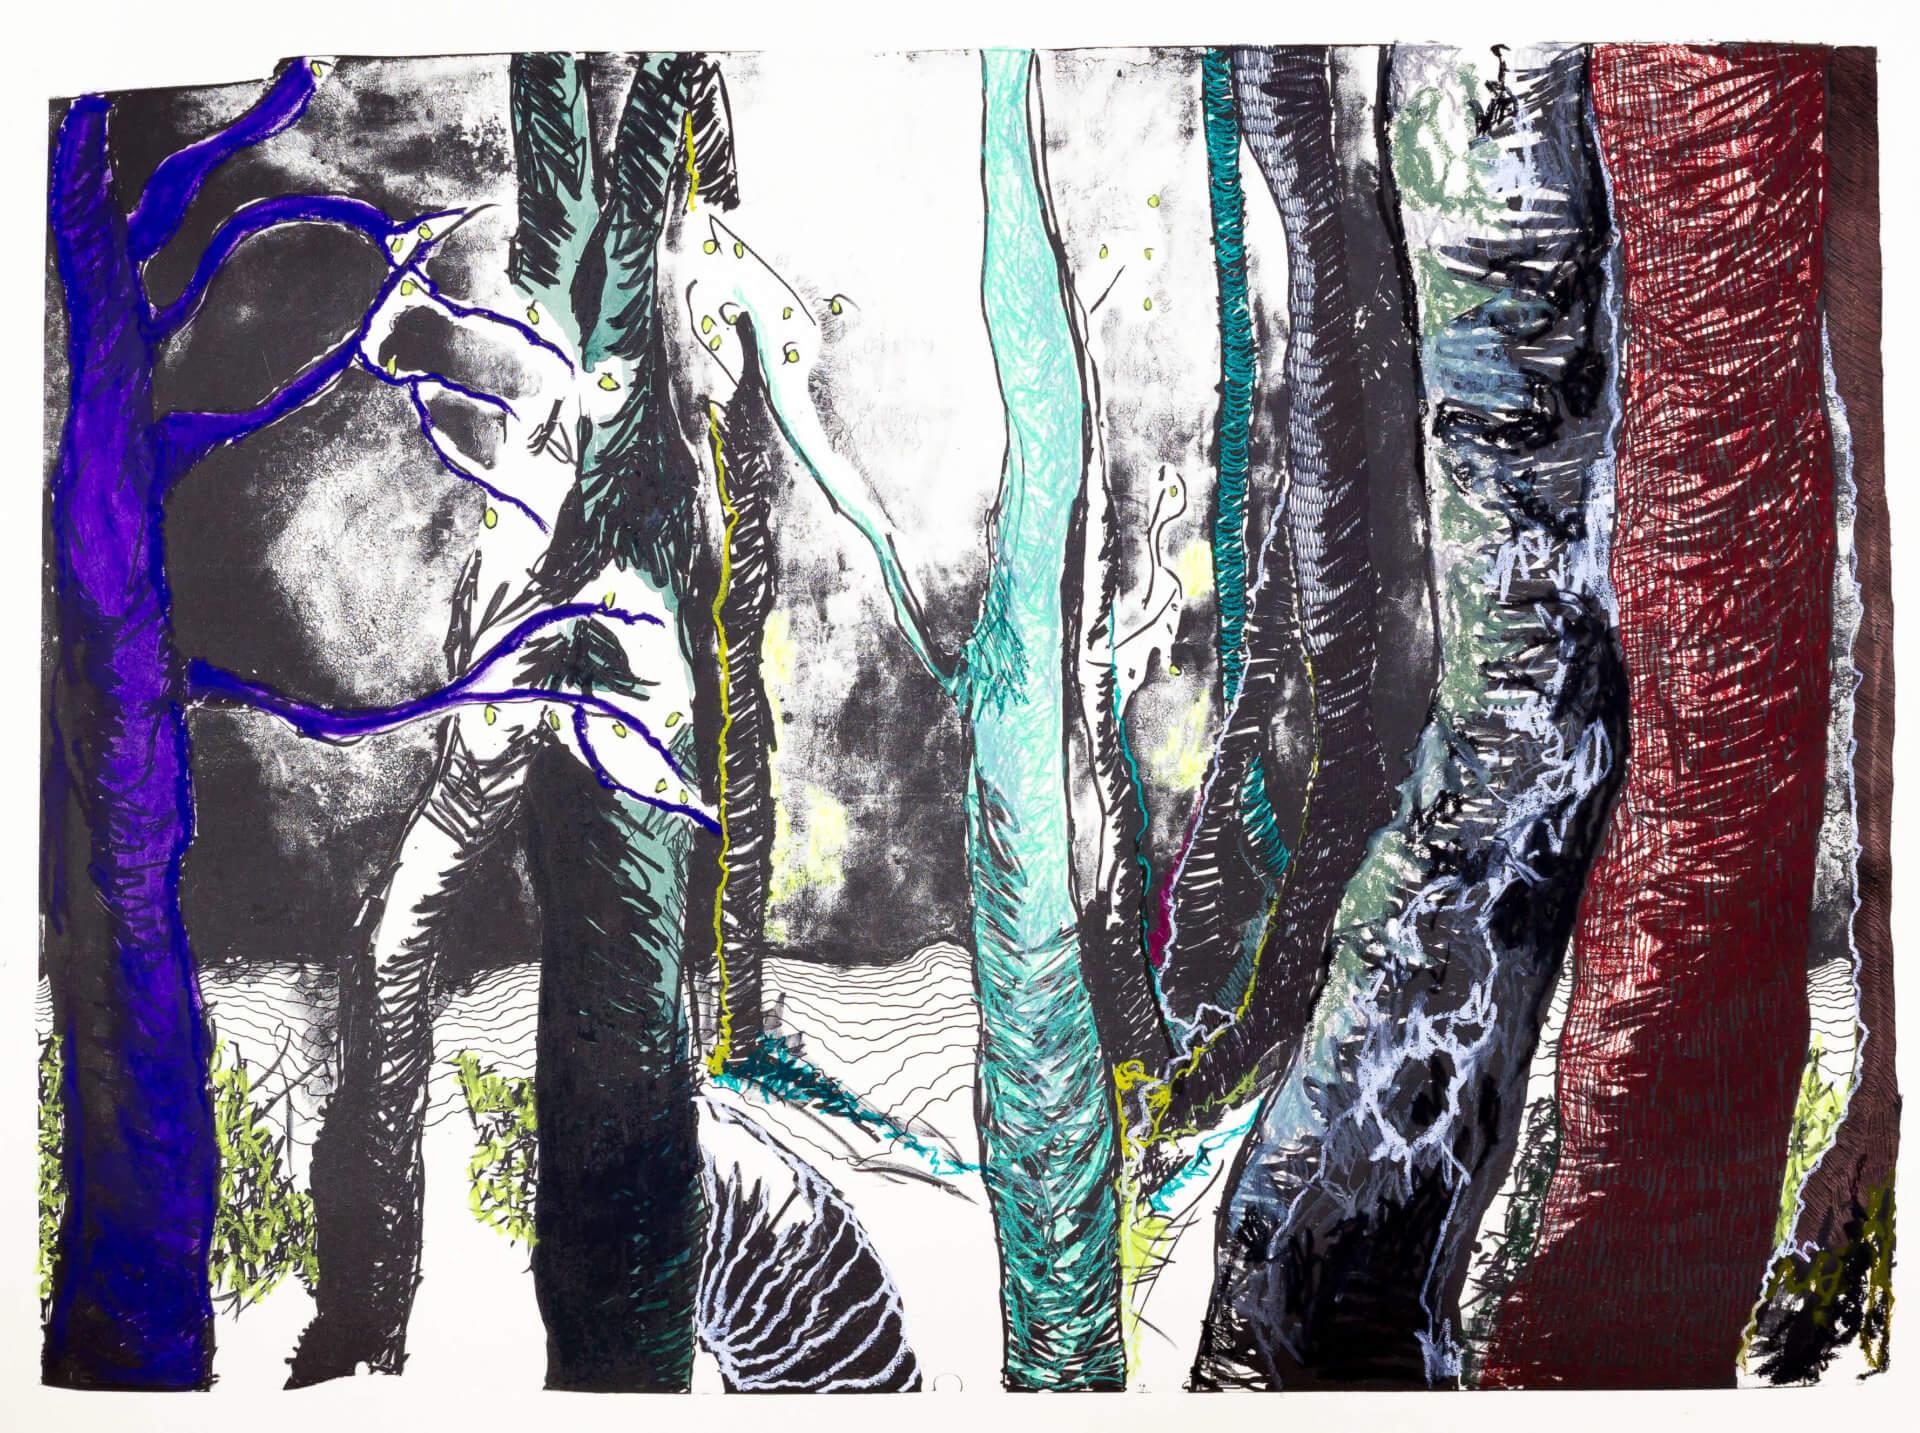 Katharina Albers, Wald (F_B)(C), 2016, Lithographie handkoloriert (Ölkreide, Graphit, Aquarellfarbe, Fineliner, Gelstift, Tusche), Unikat, 70×100 cm